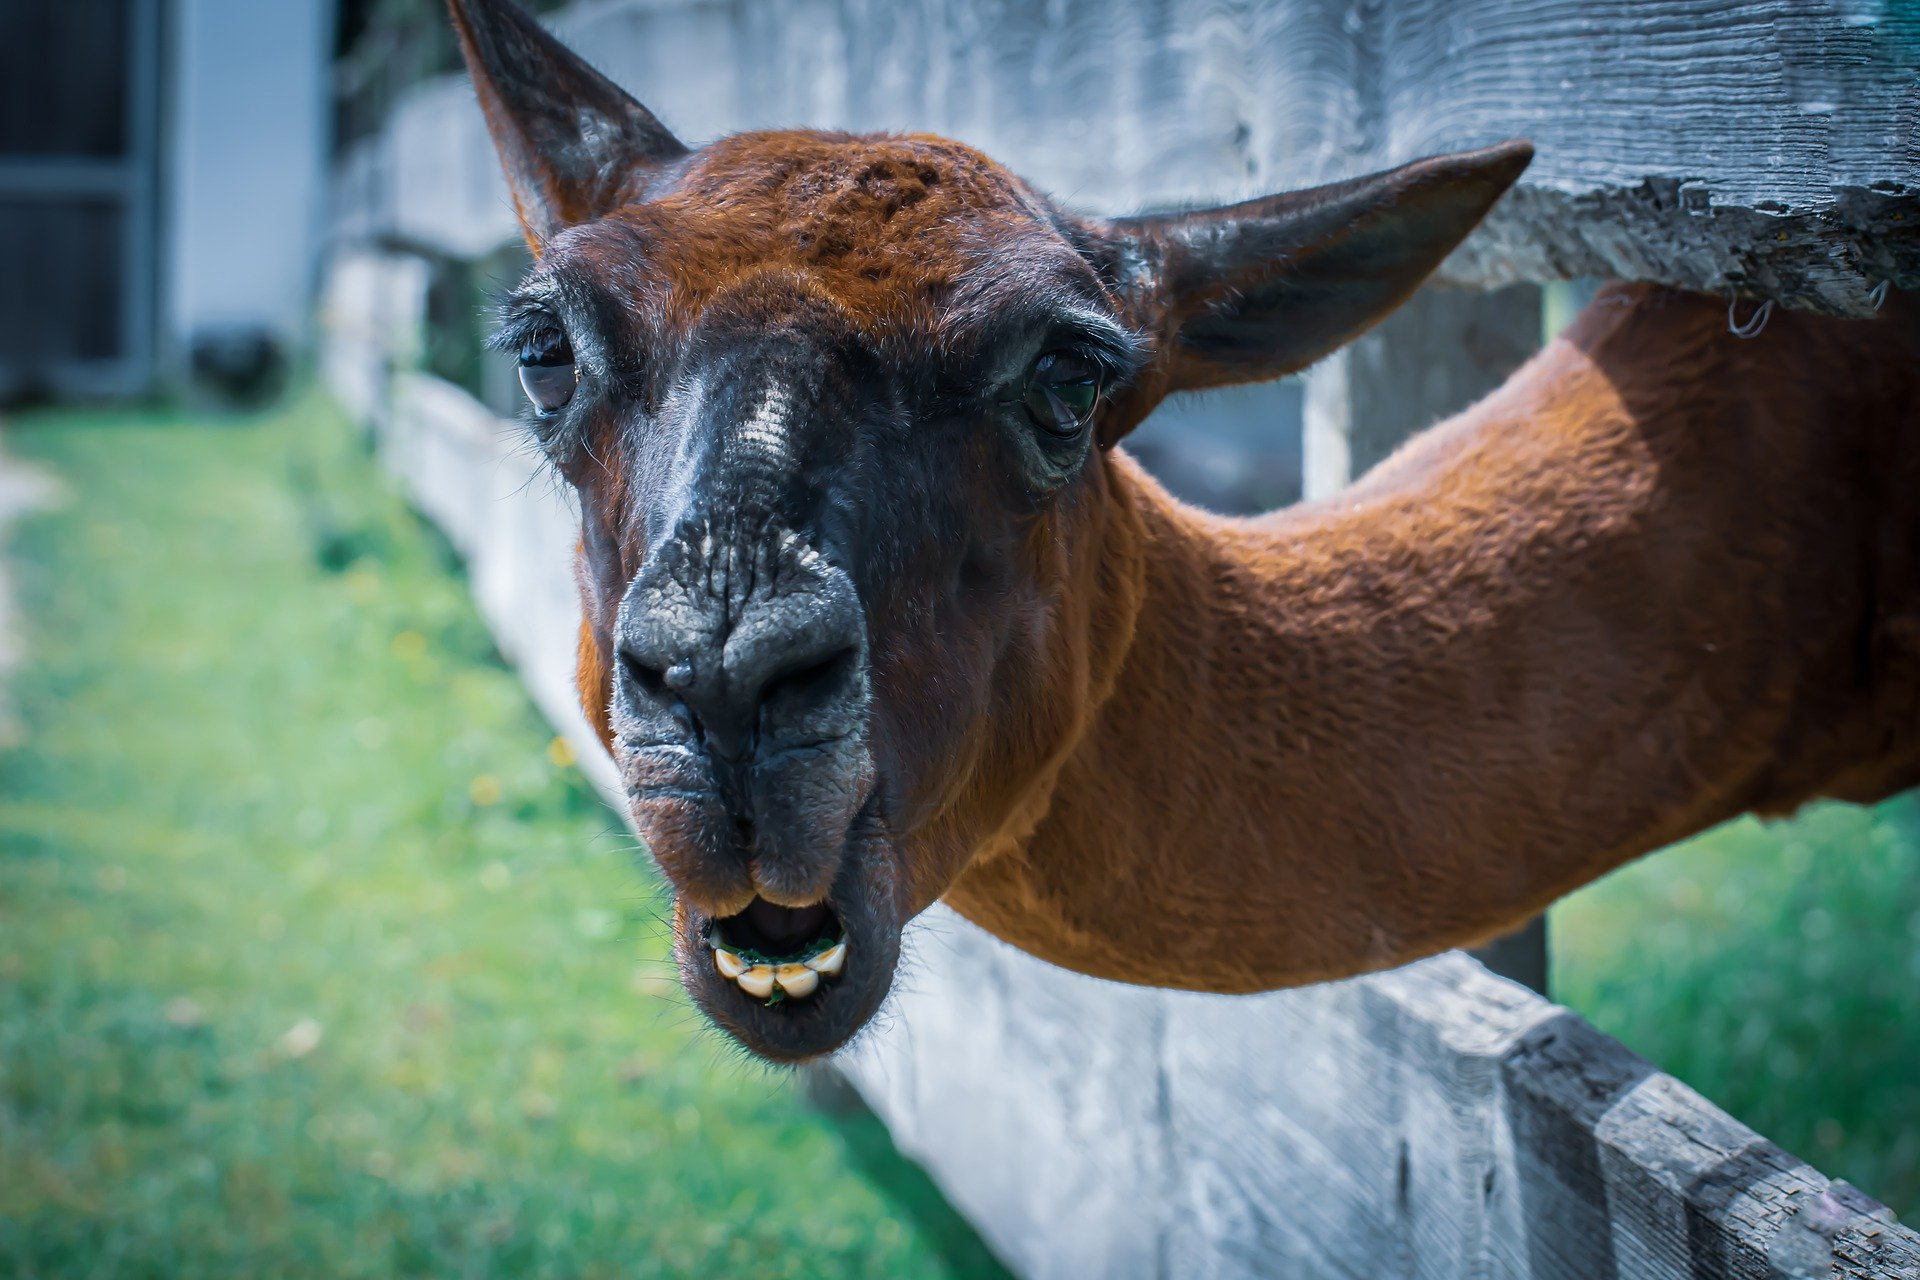 NC: антитела ламы помогают лечить коронавирус в домашних условиях